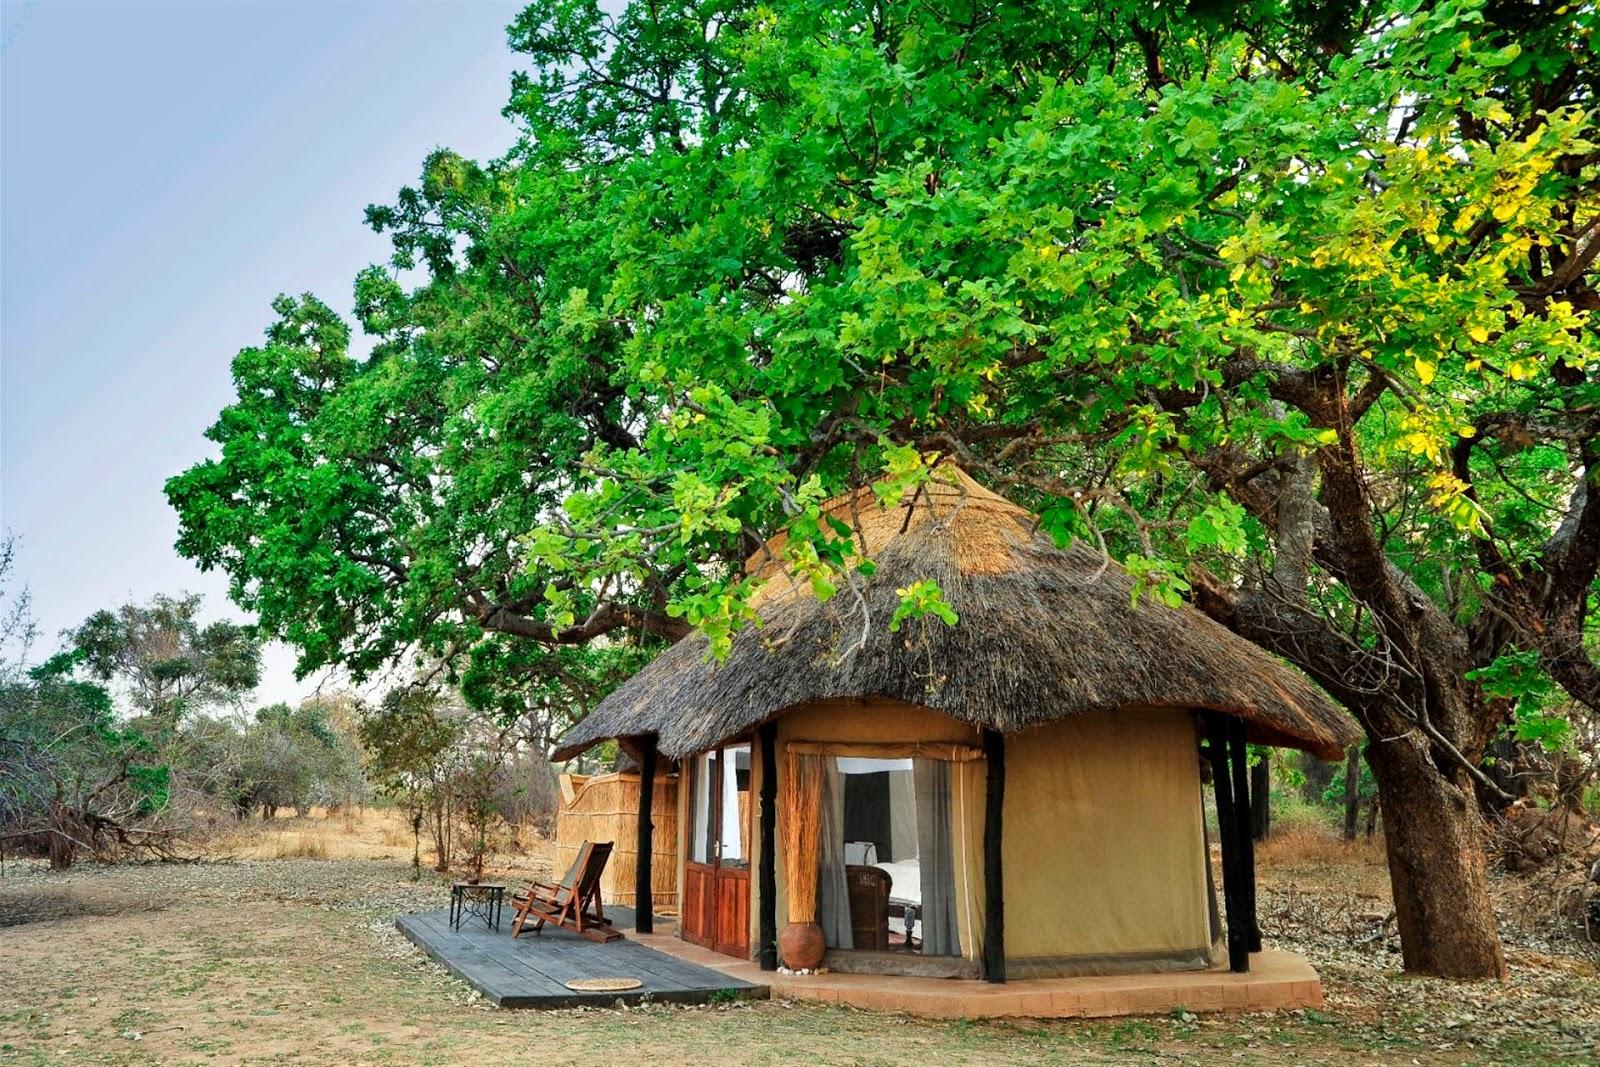 Mchenja Zambia